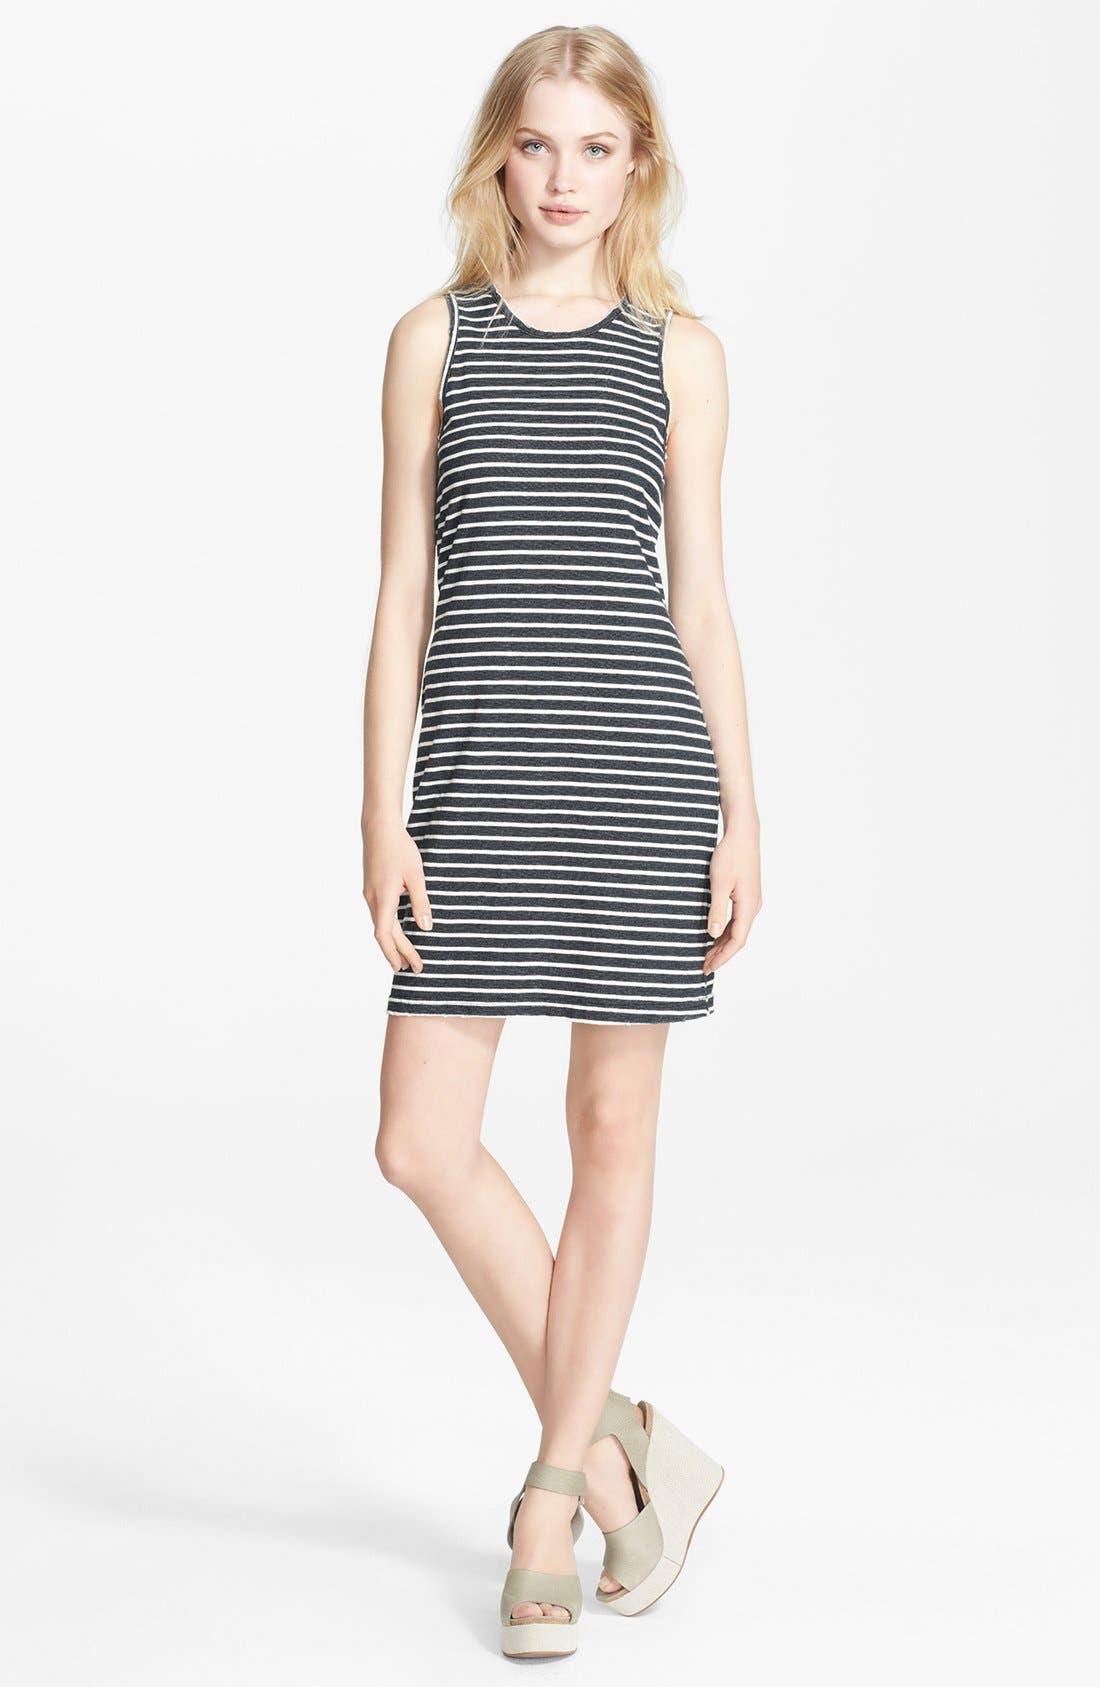 Main Image - Current/Elliott 'The Louella' Tank Dress